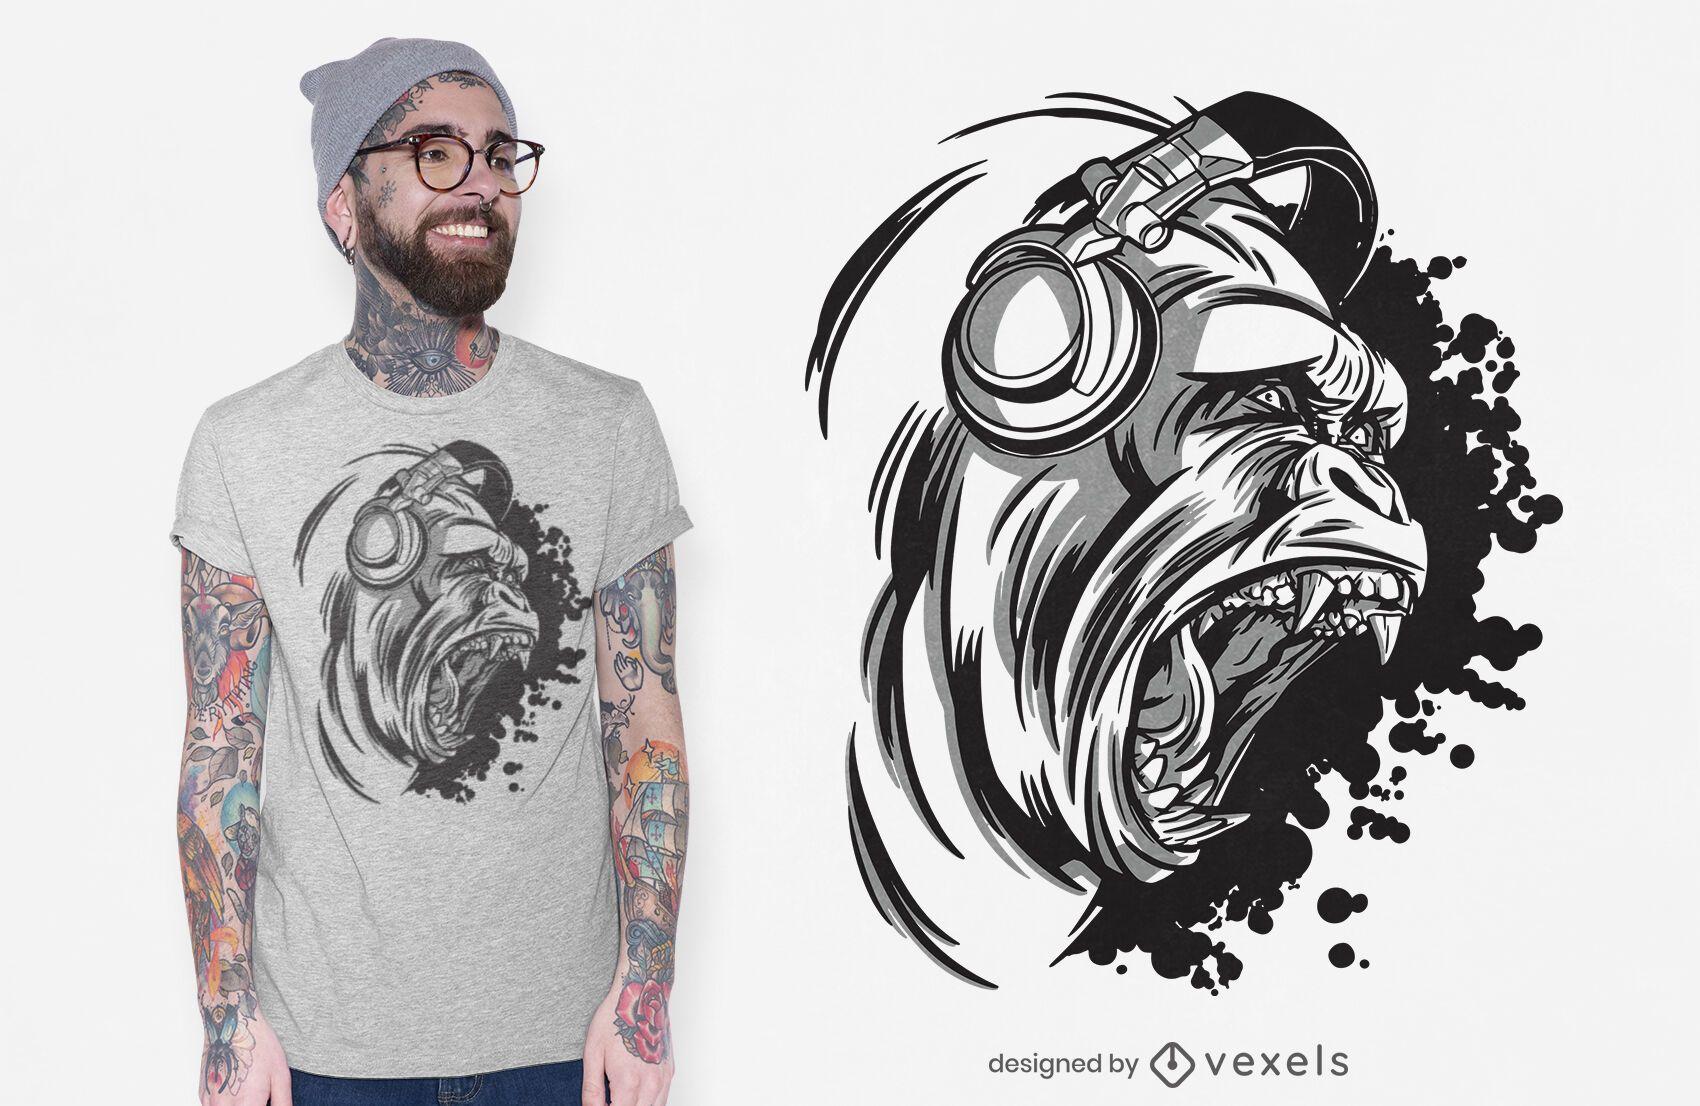 Dj gorilla t-shirt design